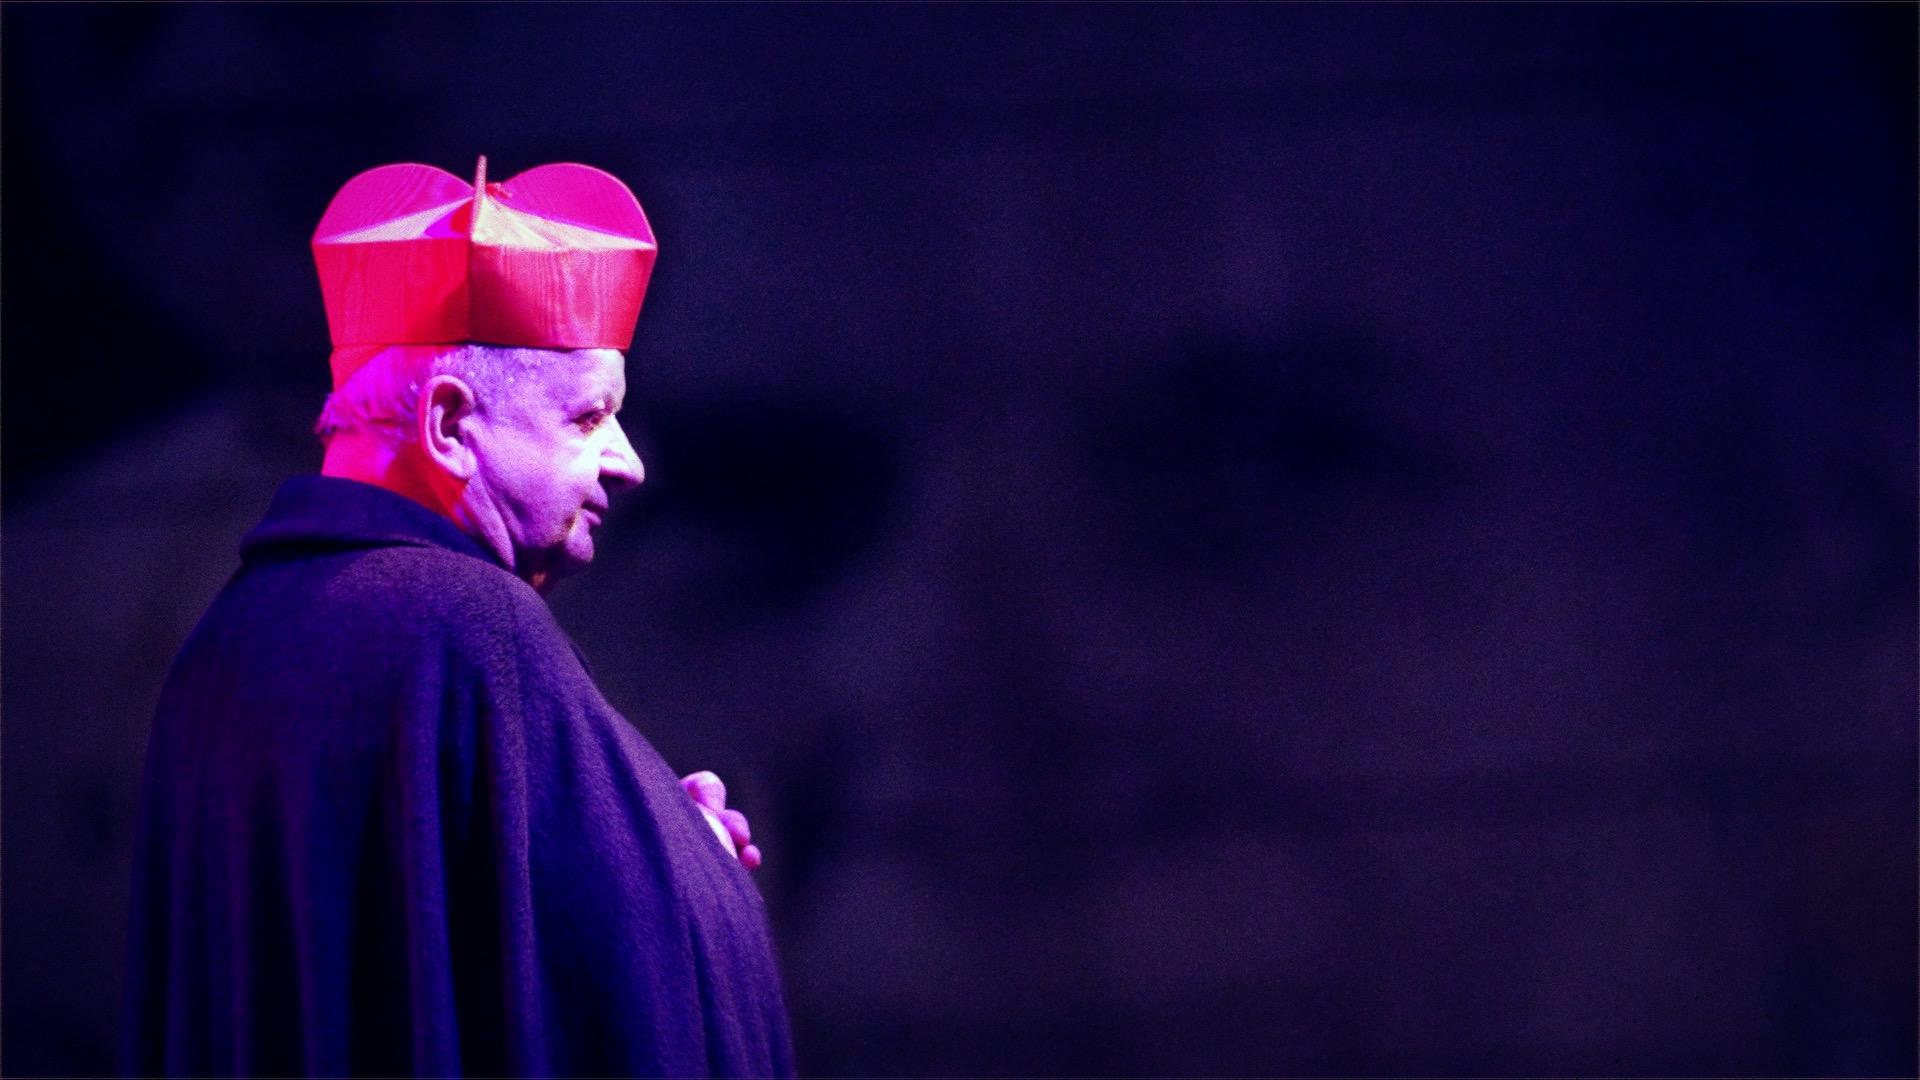 Don Stanislao. The Other Face of Cardinal Dziwisz (2020)